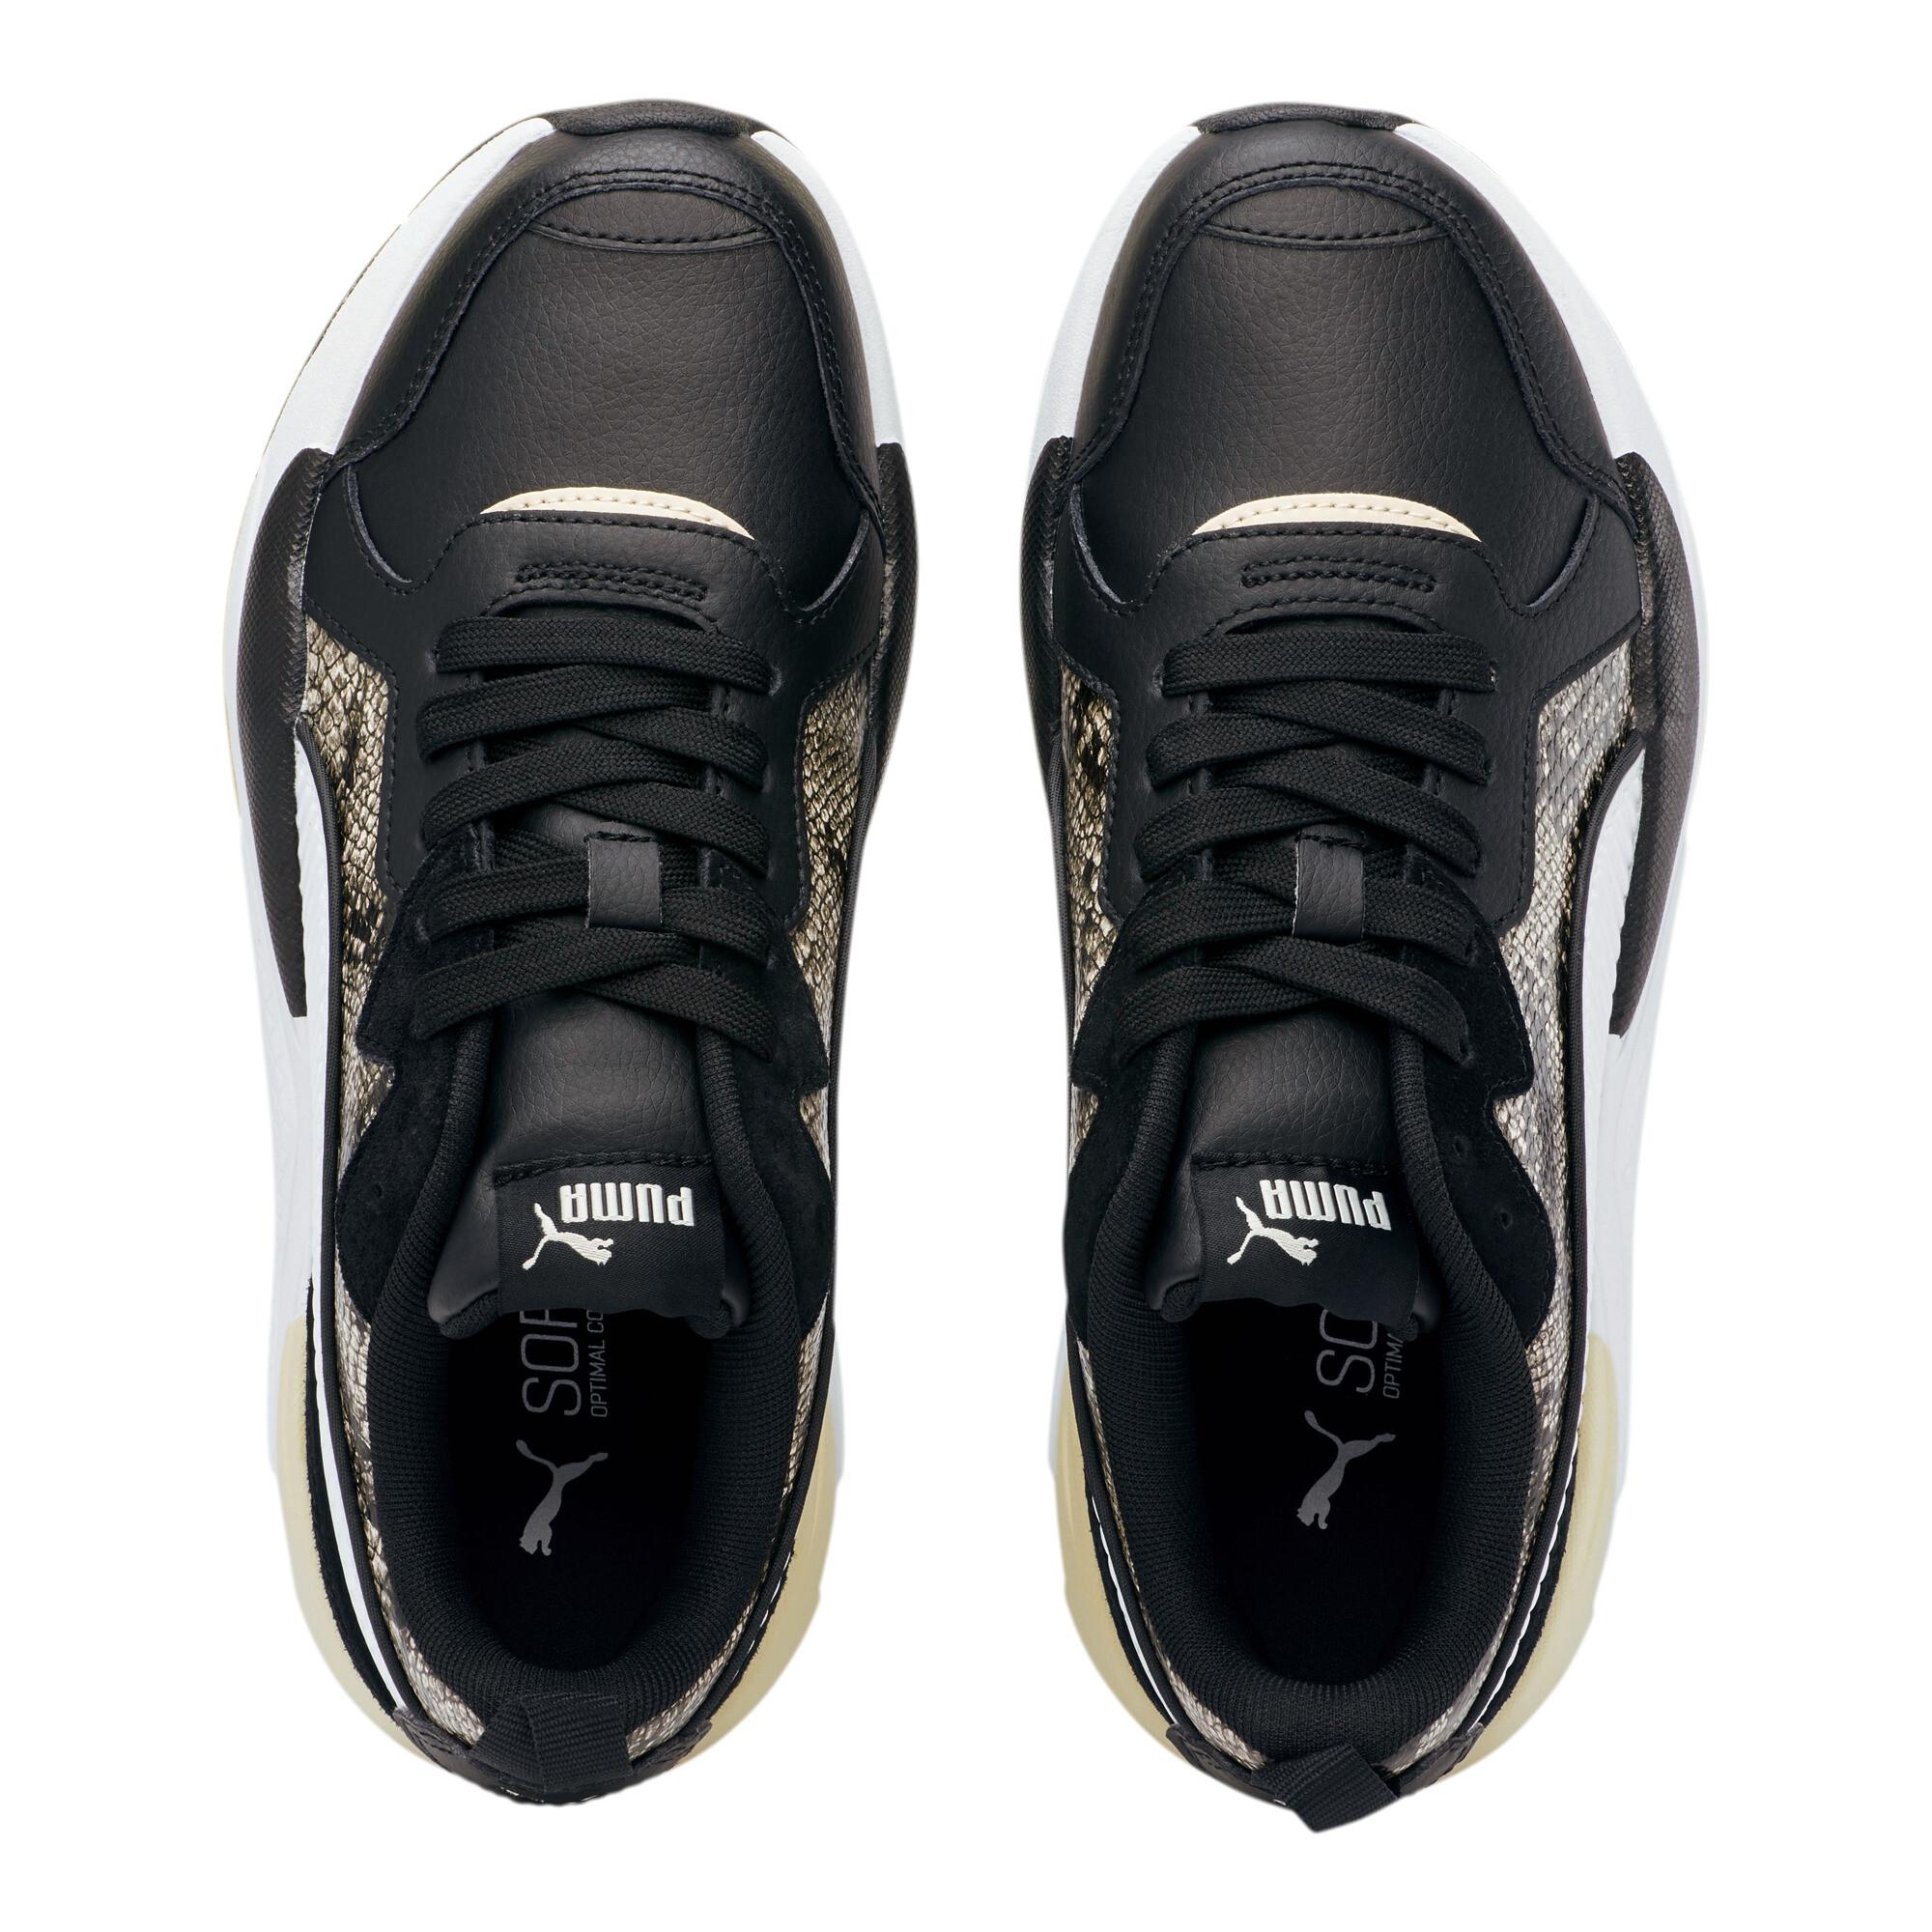 PUMA-Women-039-s-X-RAY-Reptile-Sneakers thumbnail 7